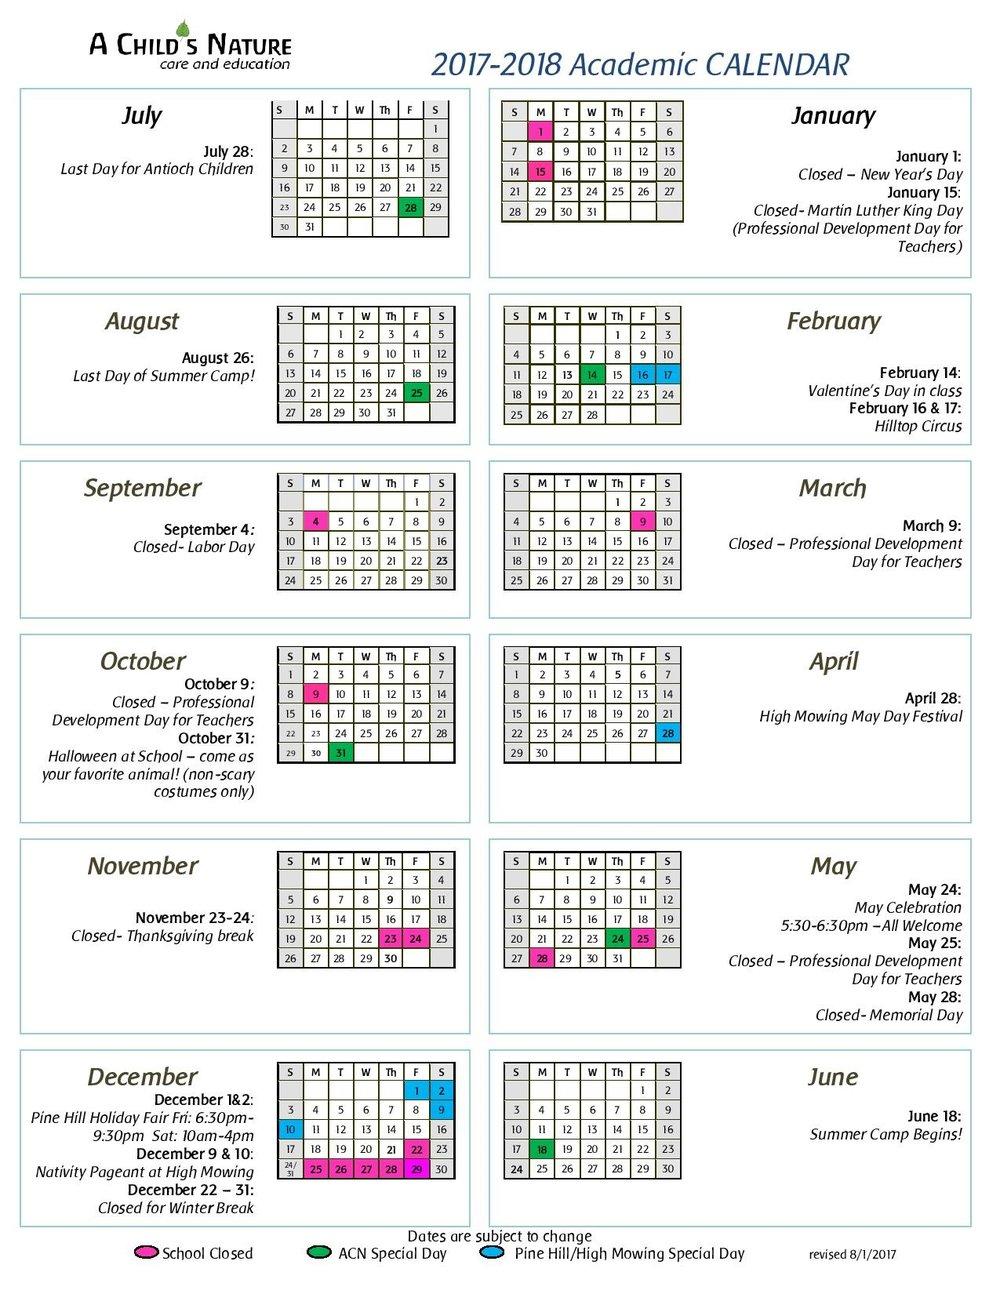 ACN Calendar 2017 2018-page-001.jpg